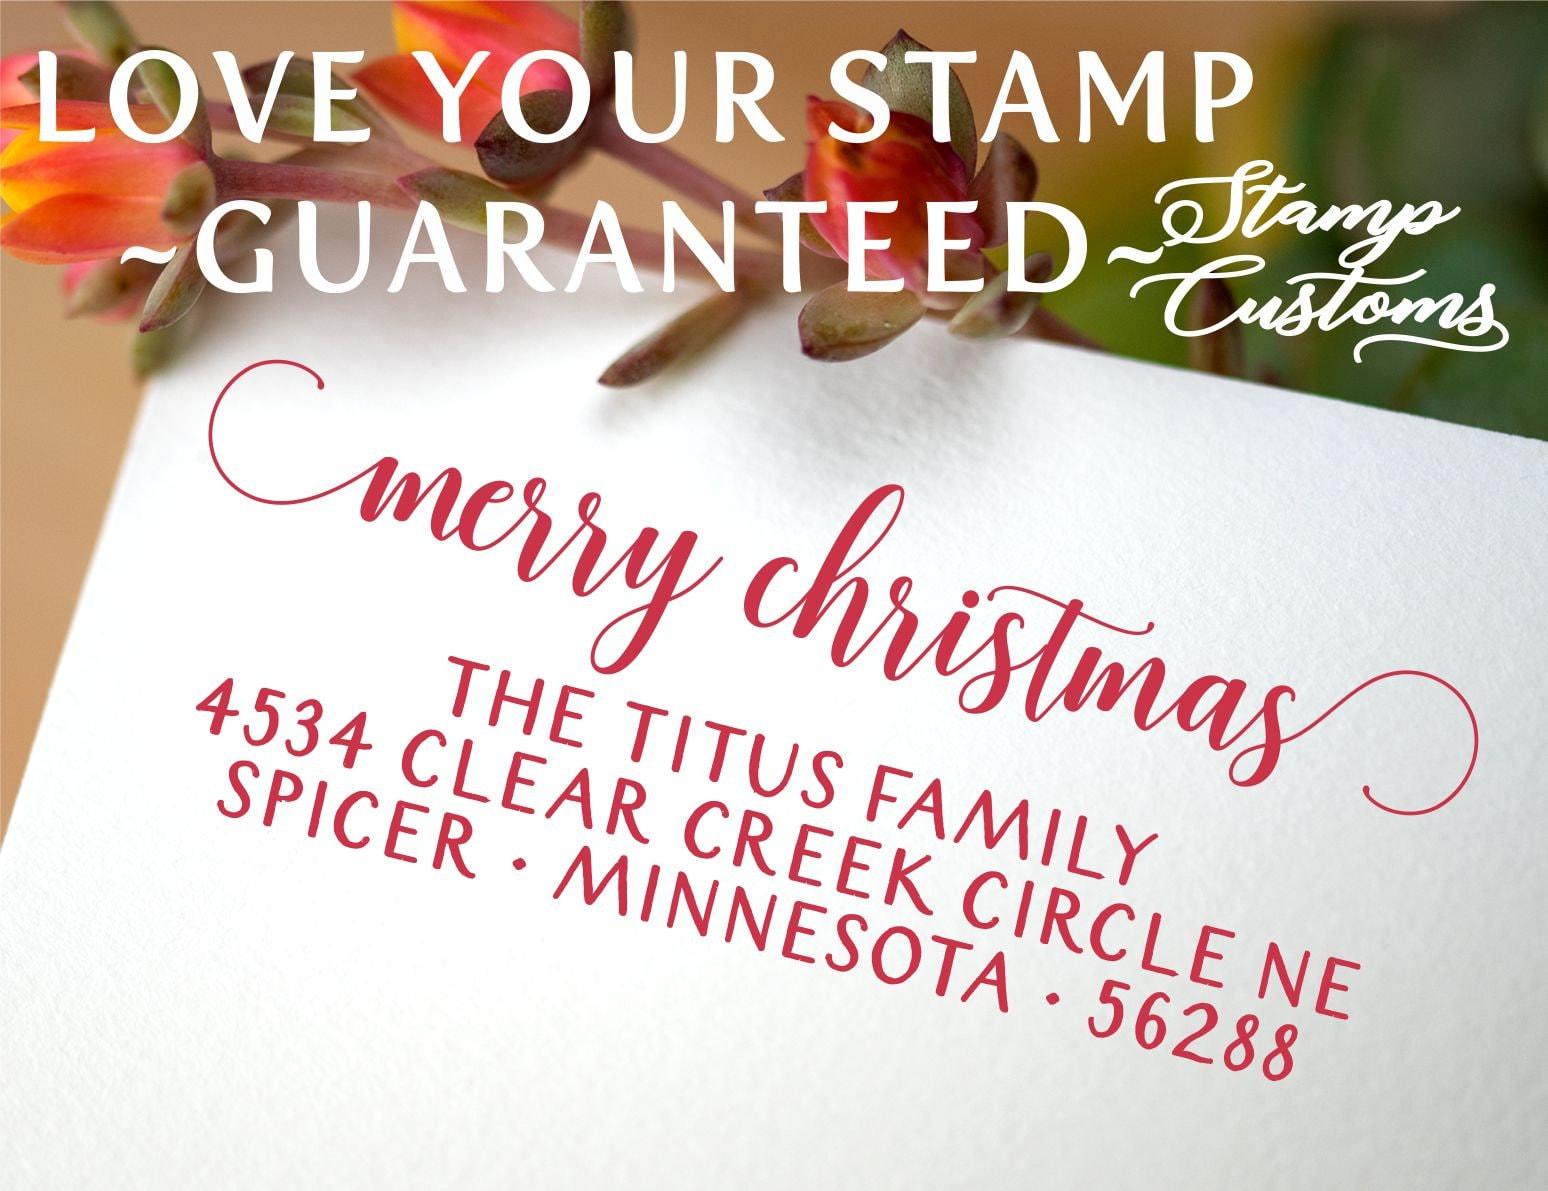 Merry Christmas Stamp Self-Inking Stamp Rubber Stamp Holiday Stamp Christmas Card Stamp Custom Address Stamp #146 Return Address Stamp